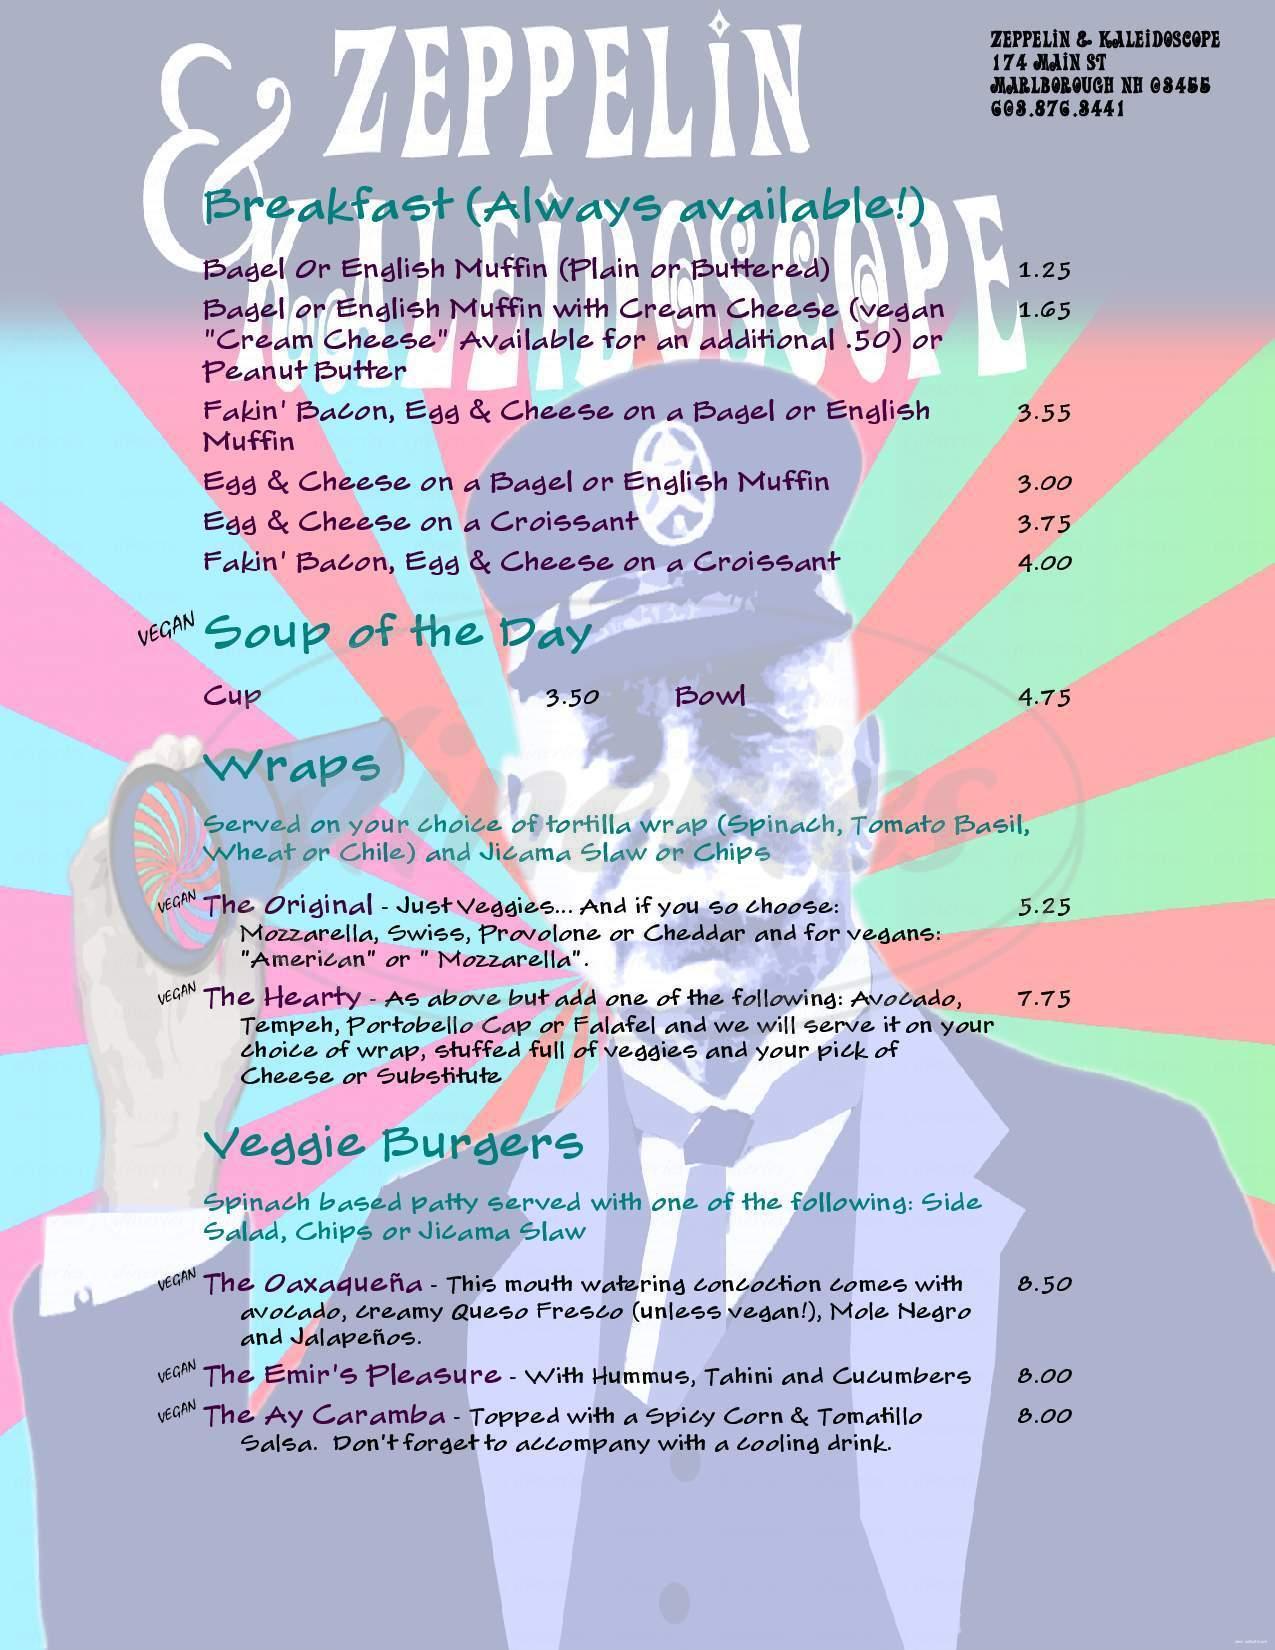 menu for Zeppelin & Kaleidoscope